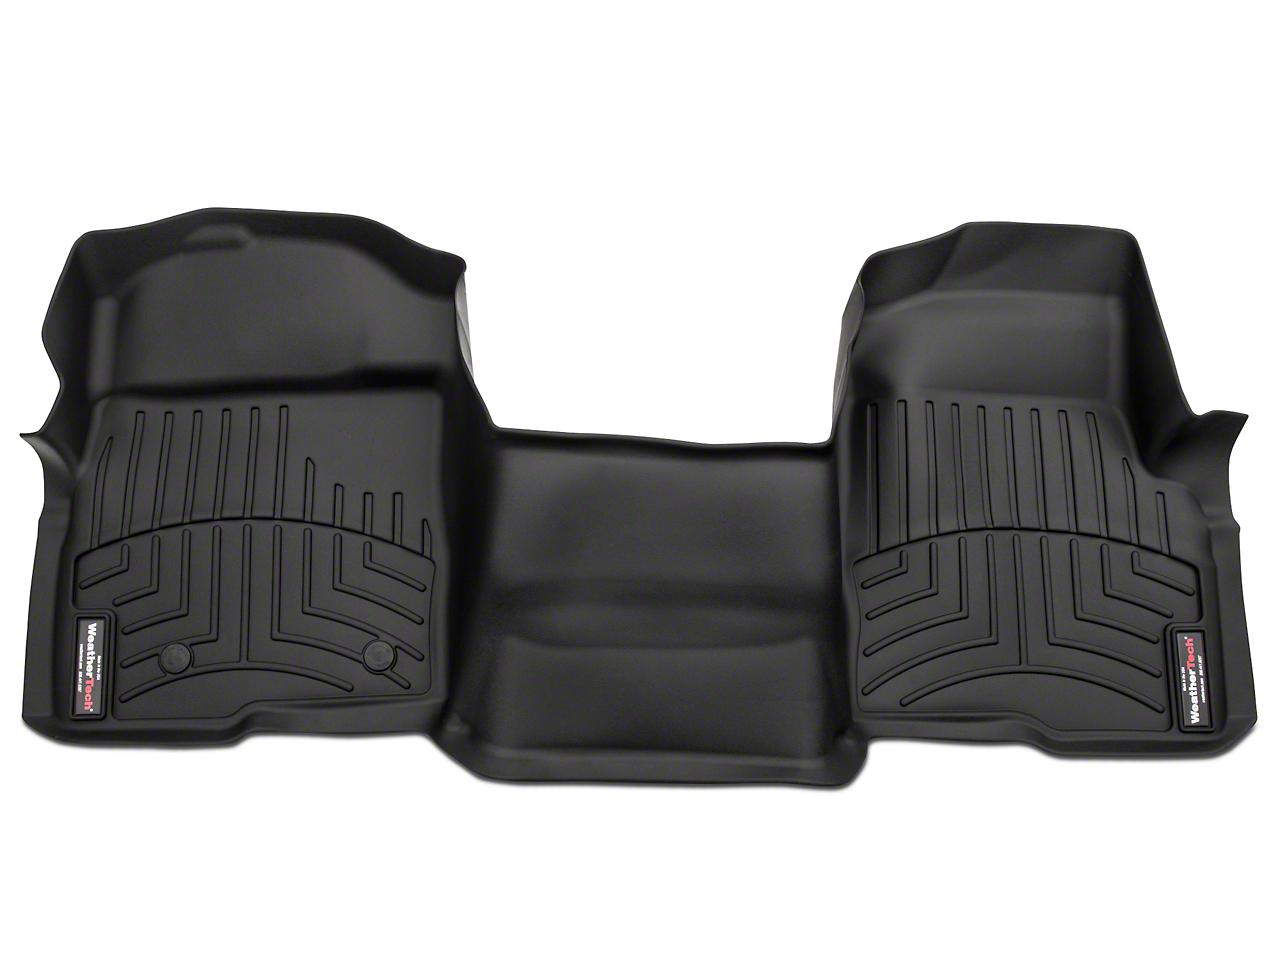 Weathertech DigitalFit Front Floor Mat - Over The Hump - Black (07-13 Sierra 1500)